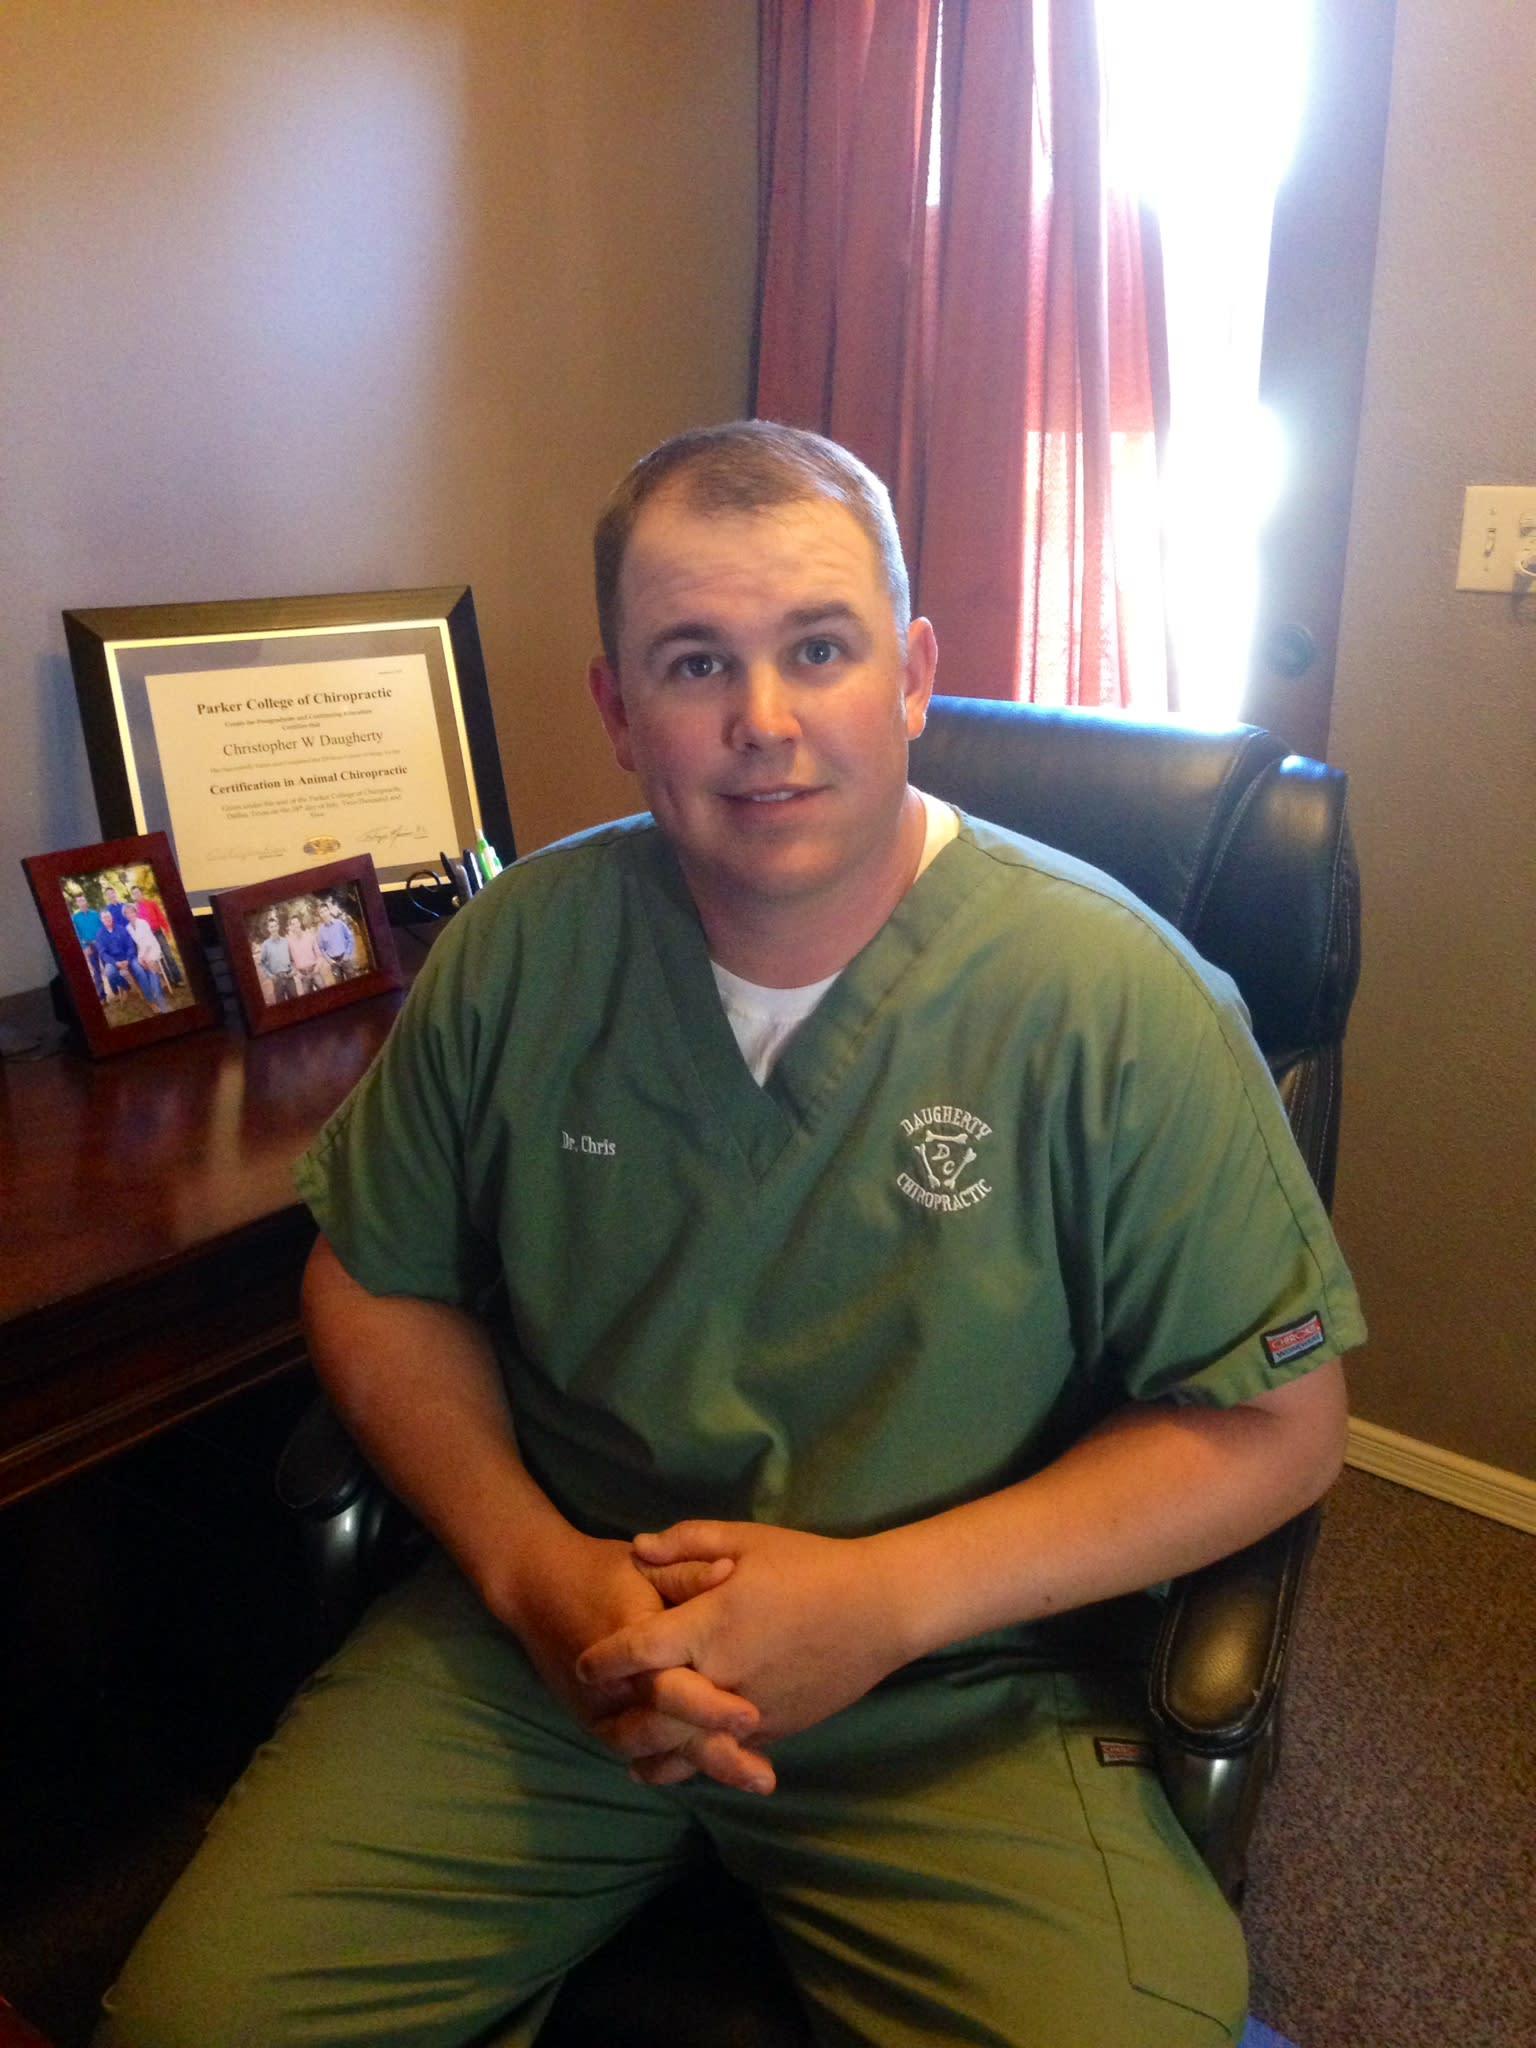 Chris W Daugherty, DC Chiropractor